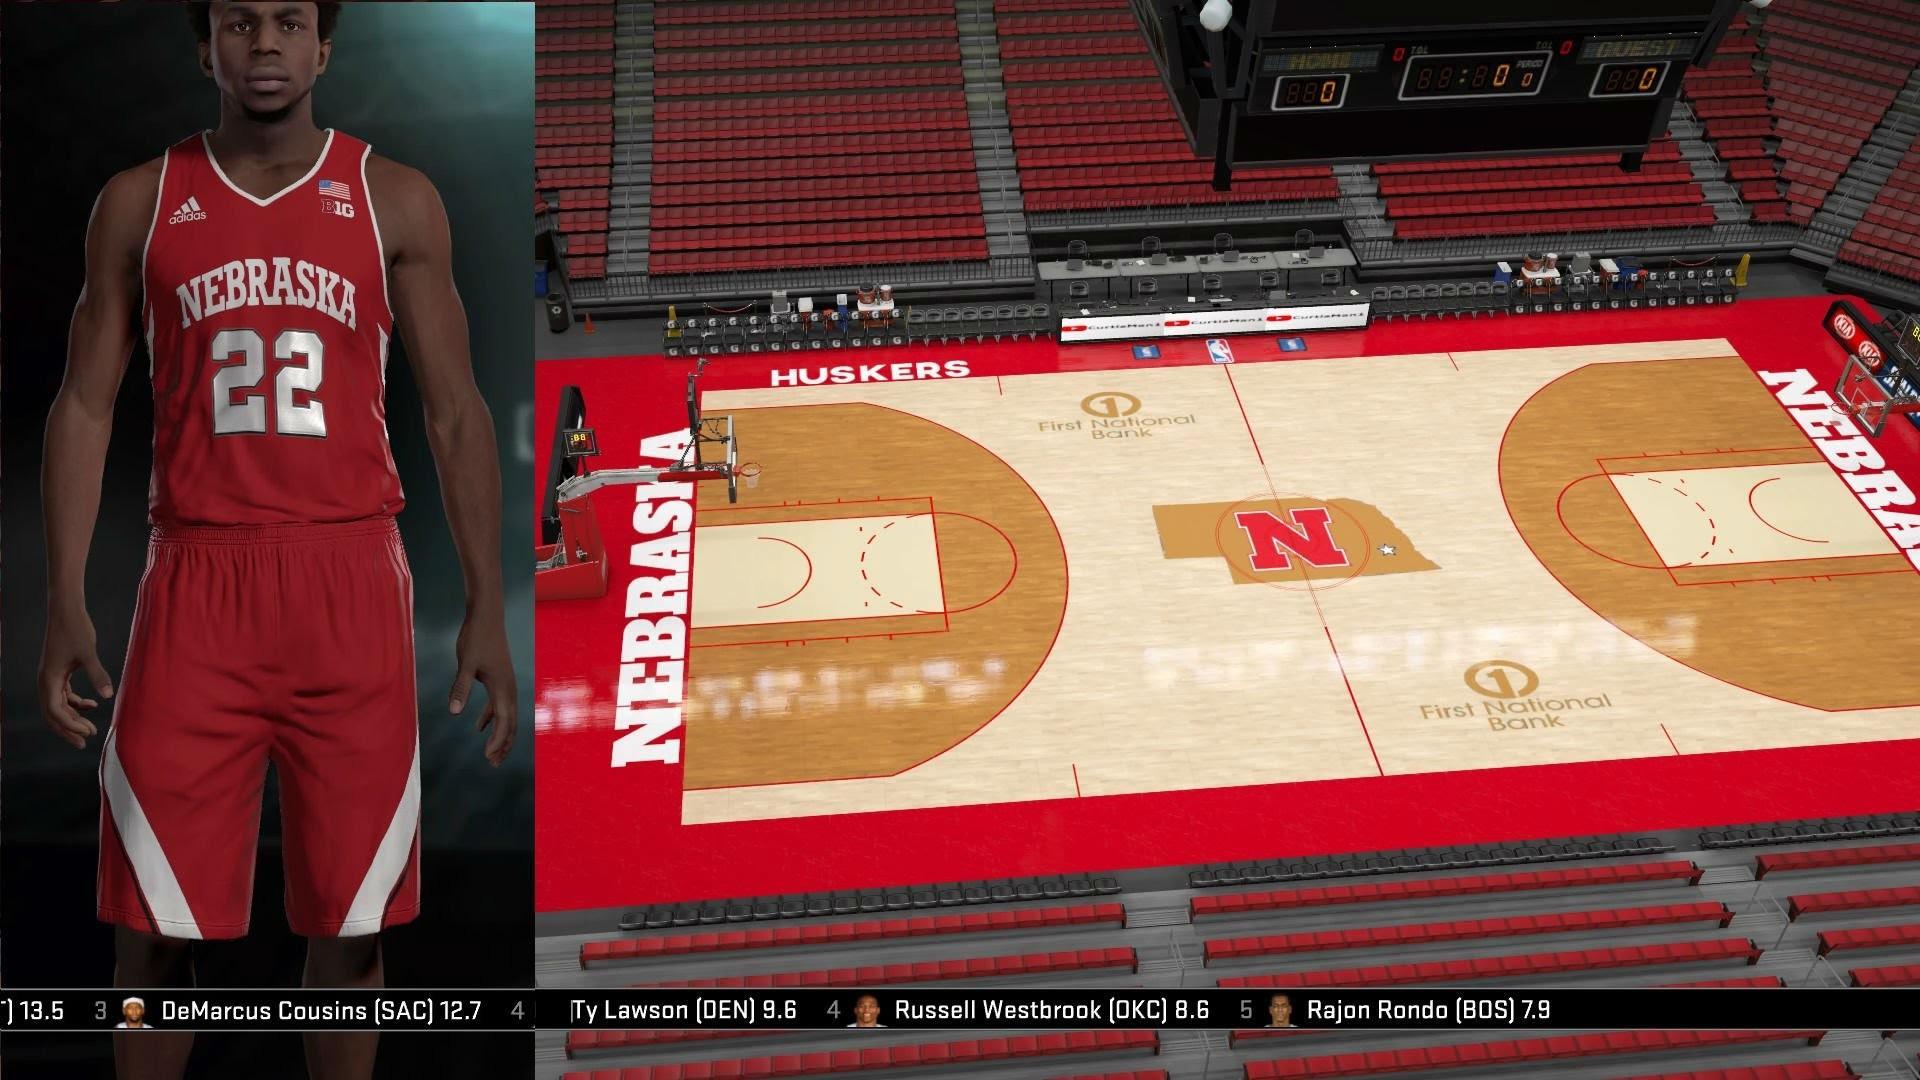 Nebraska Cornhuskers Jerseys & Arena Tutorial (NBA 2K16)